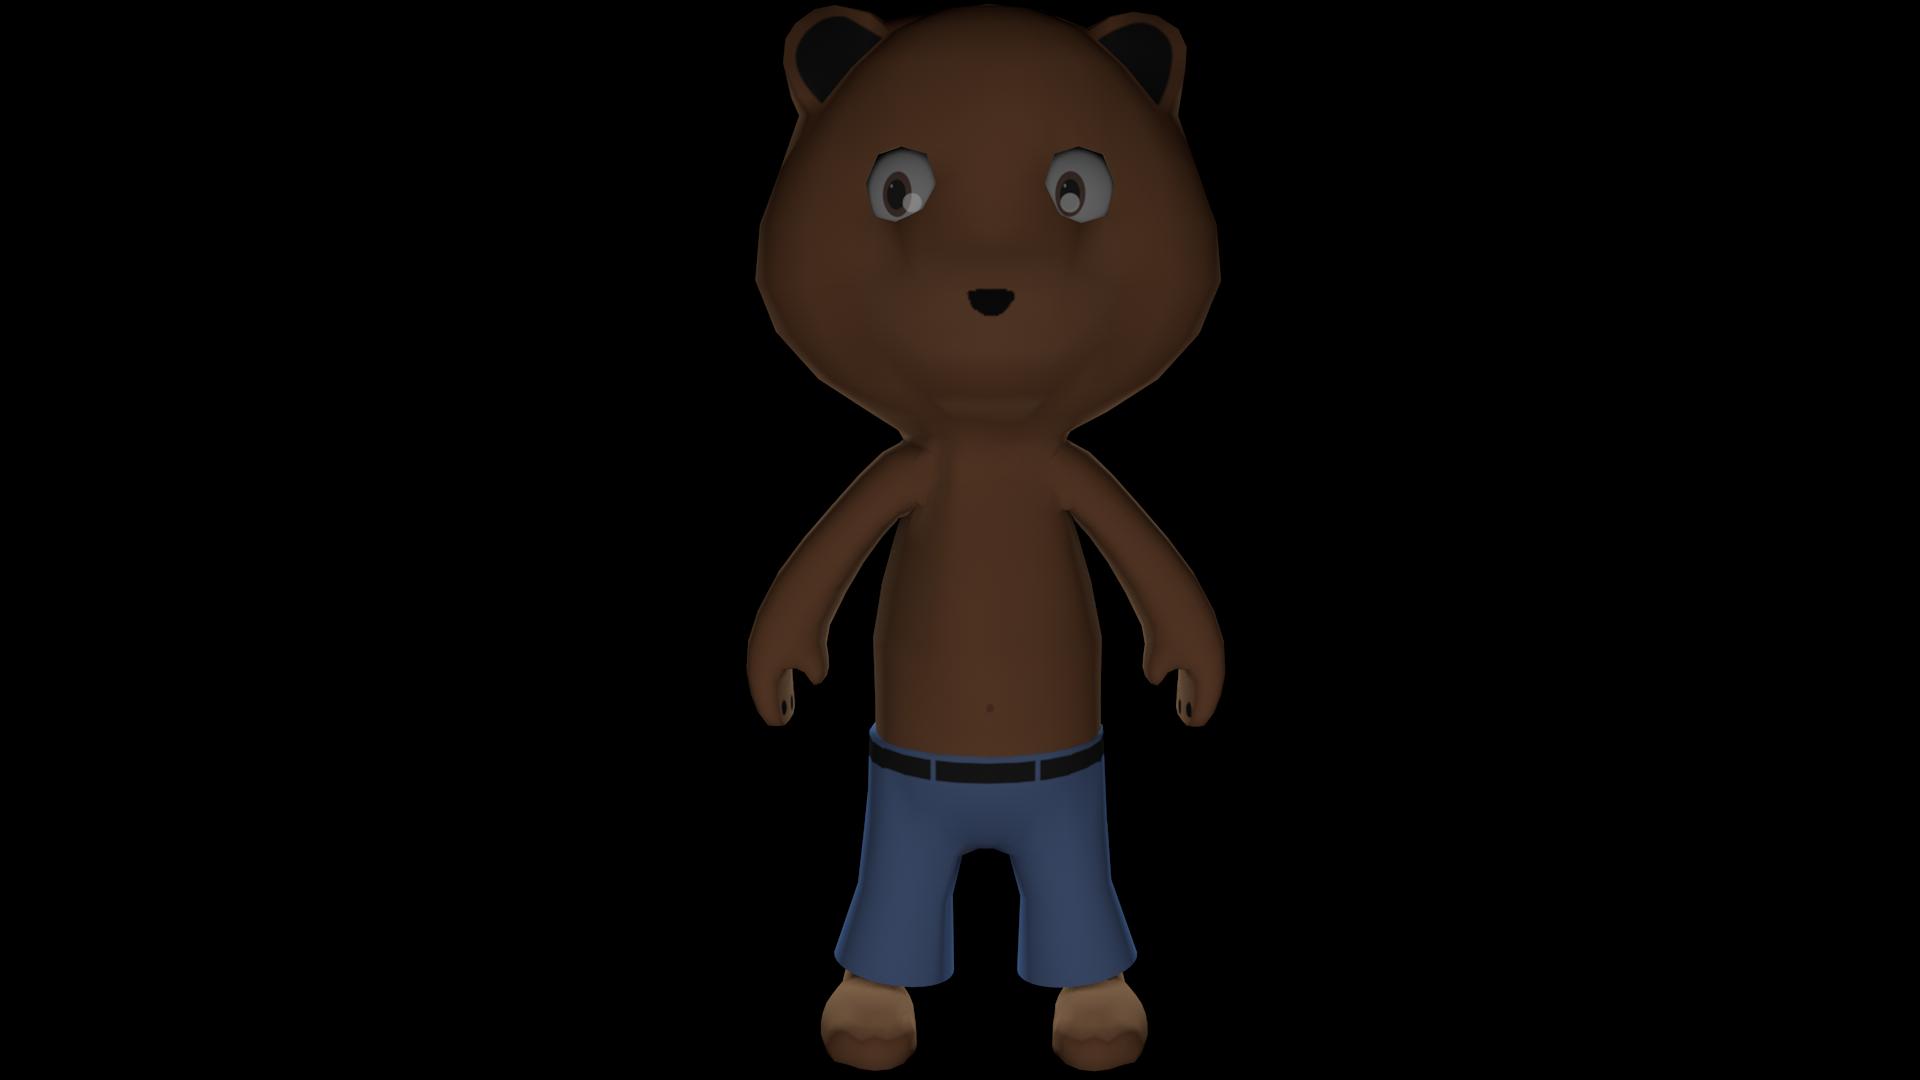 New character model!